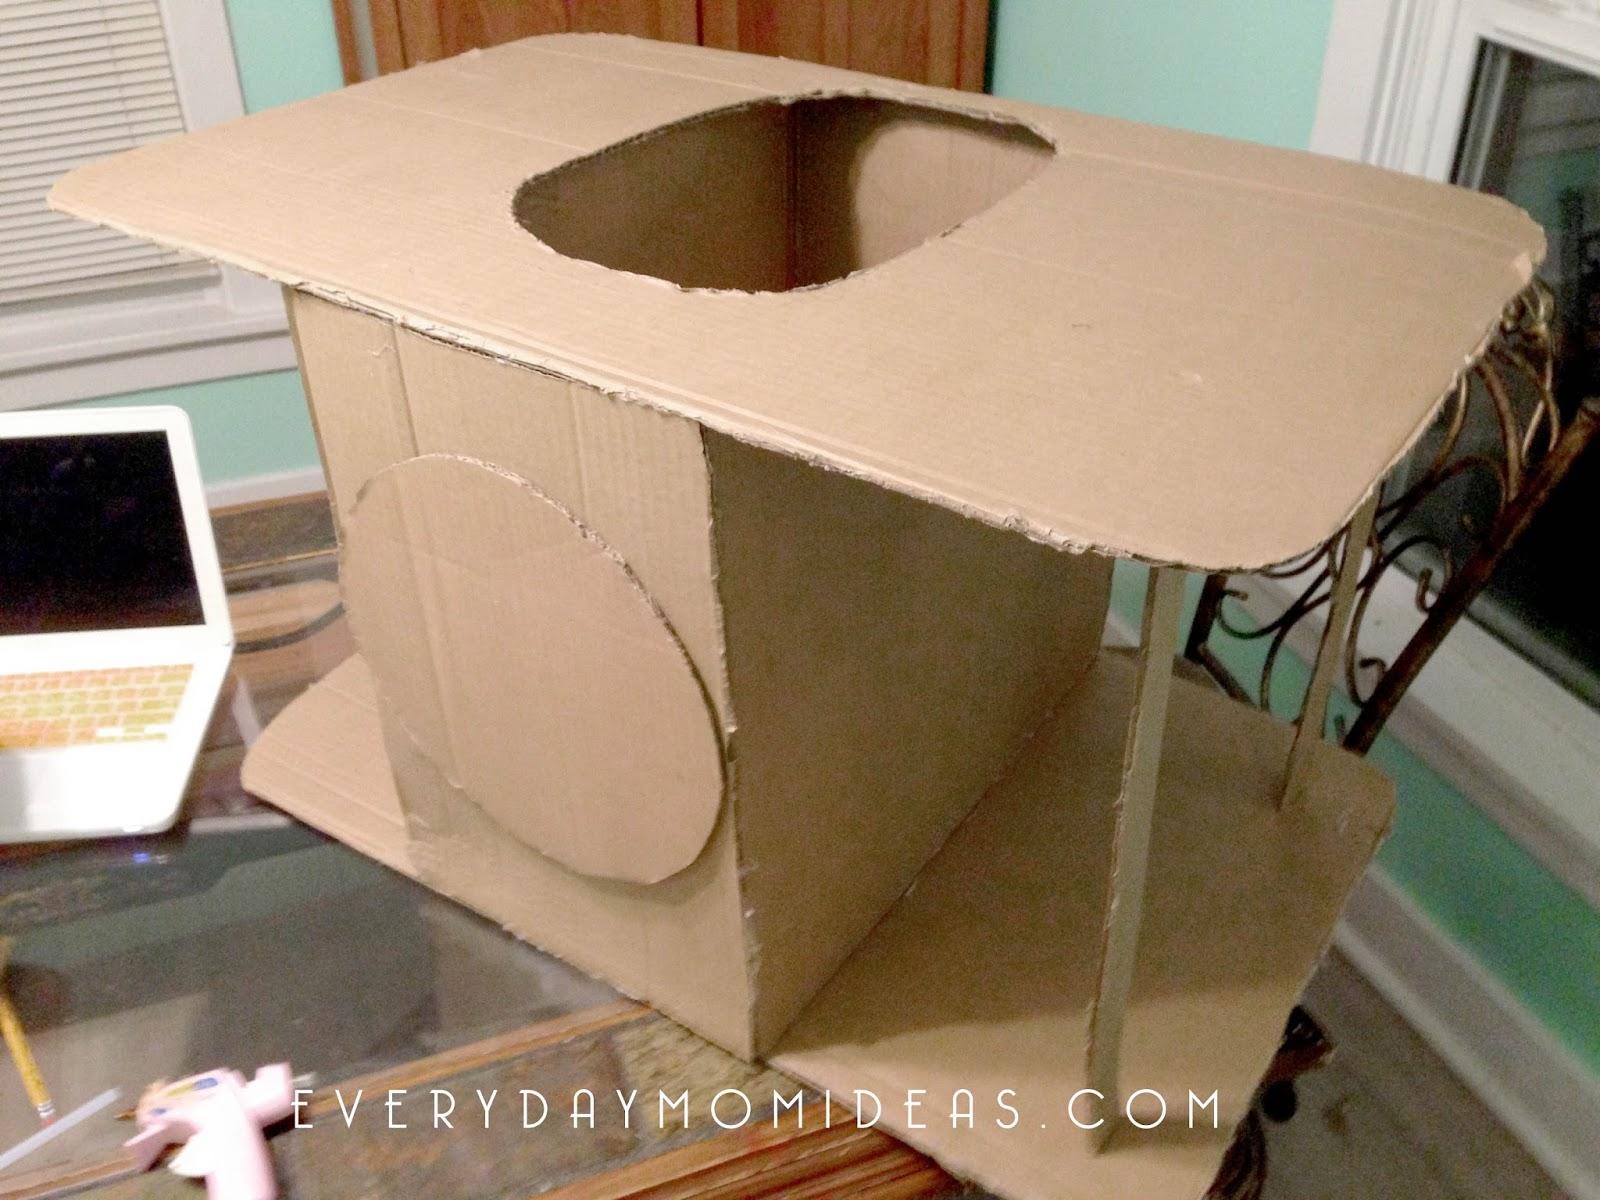 cardboard car costume instructions